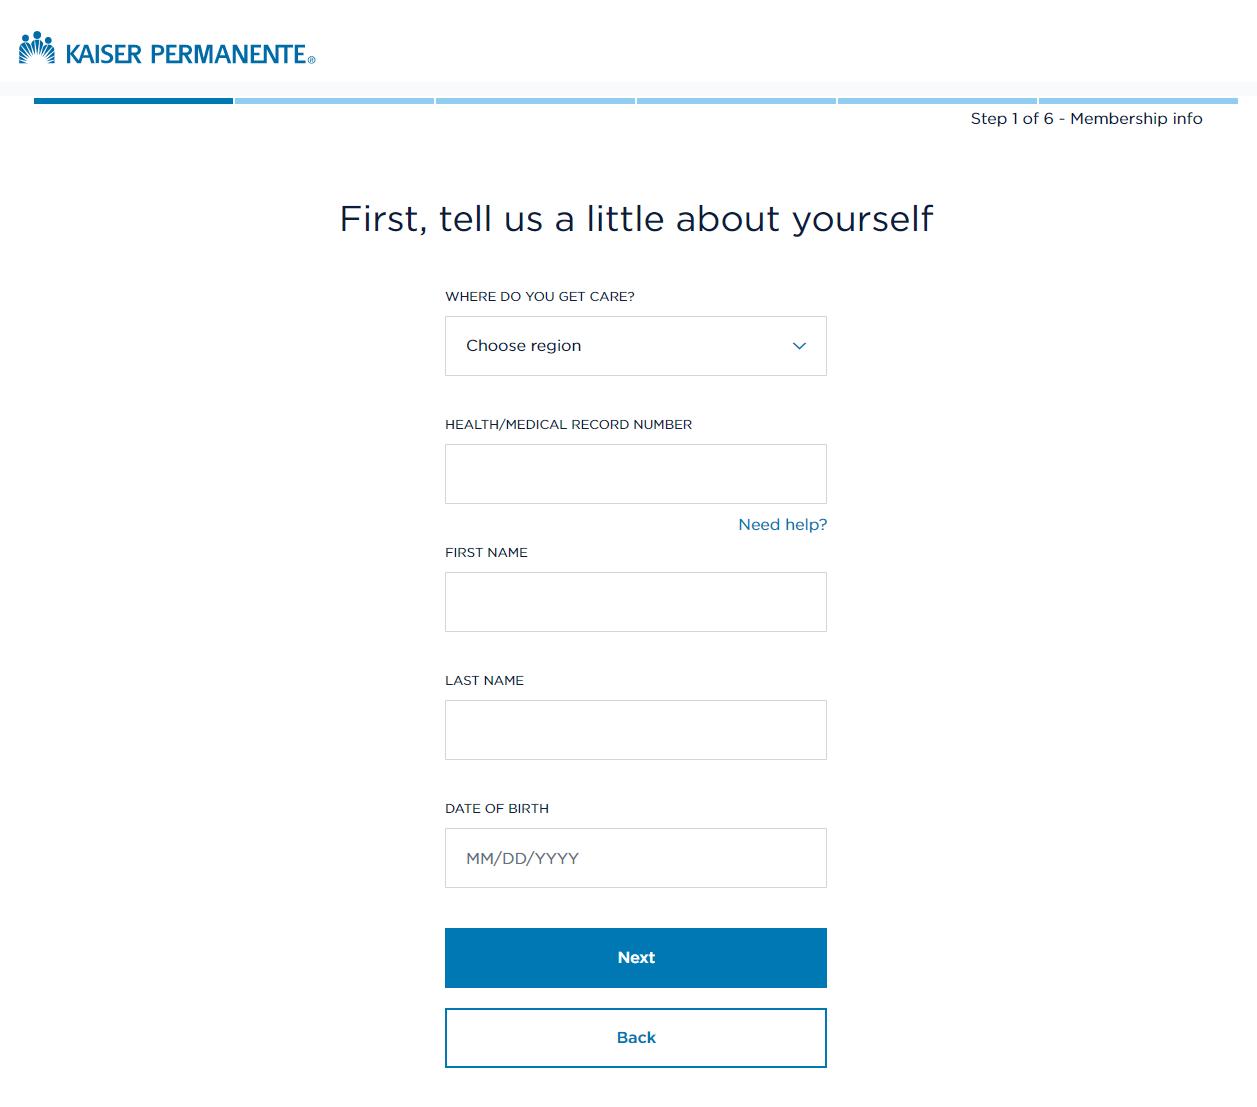 Kaiser Permanente Registration